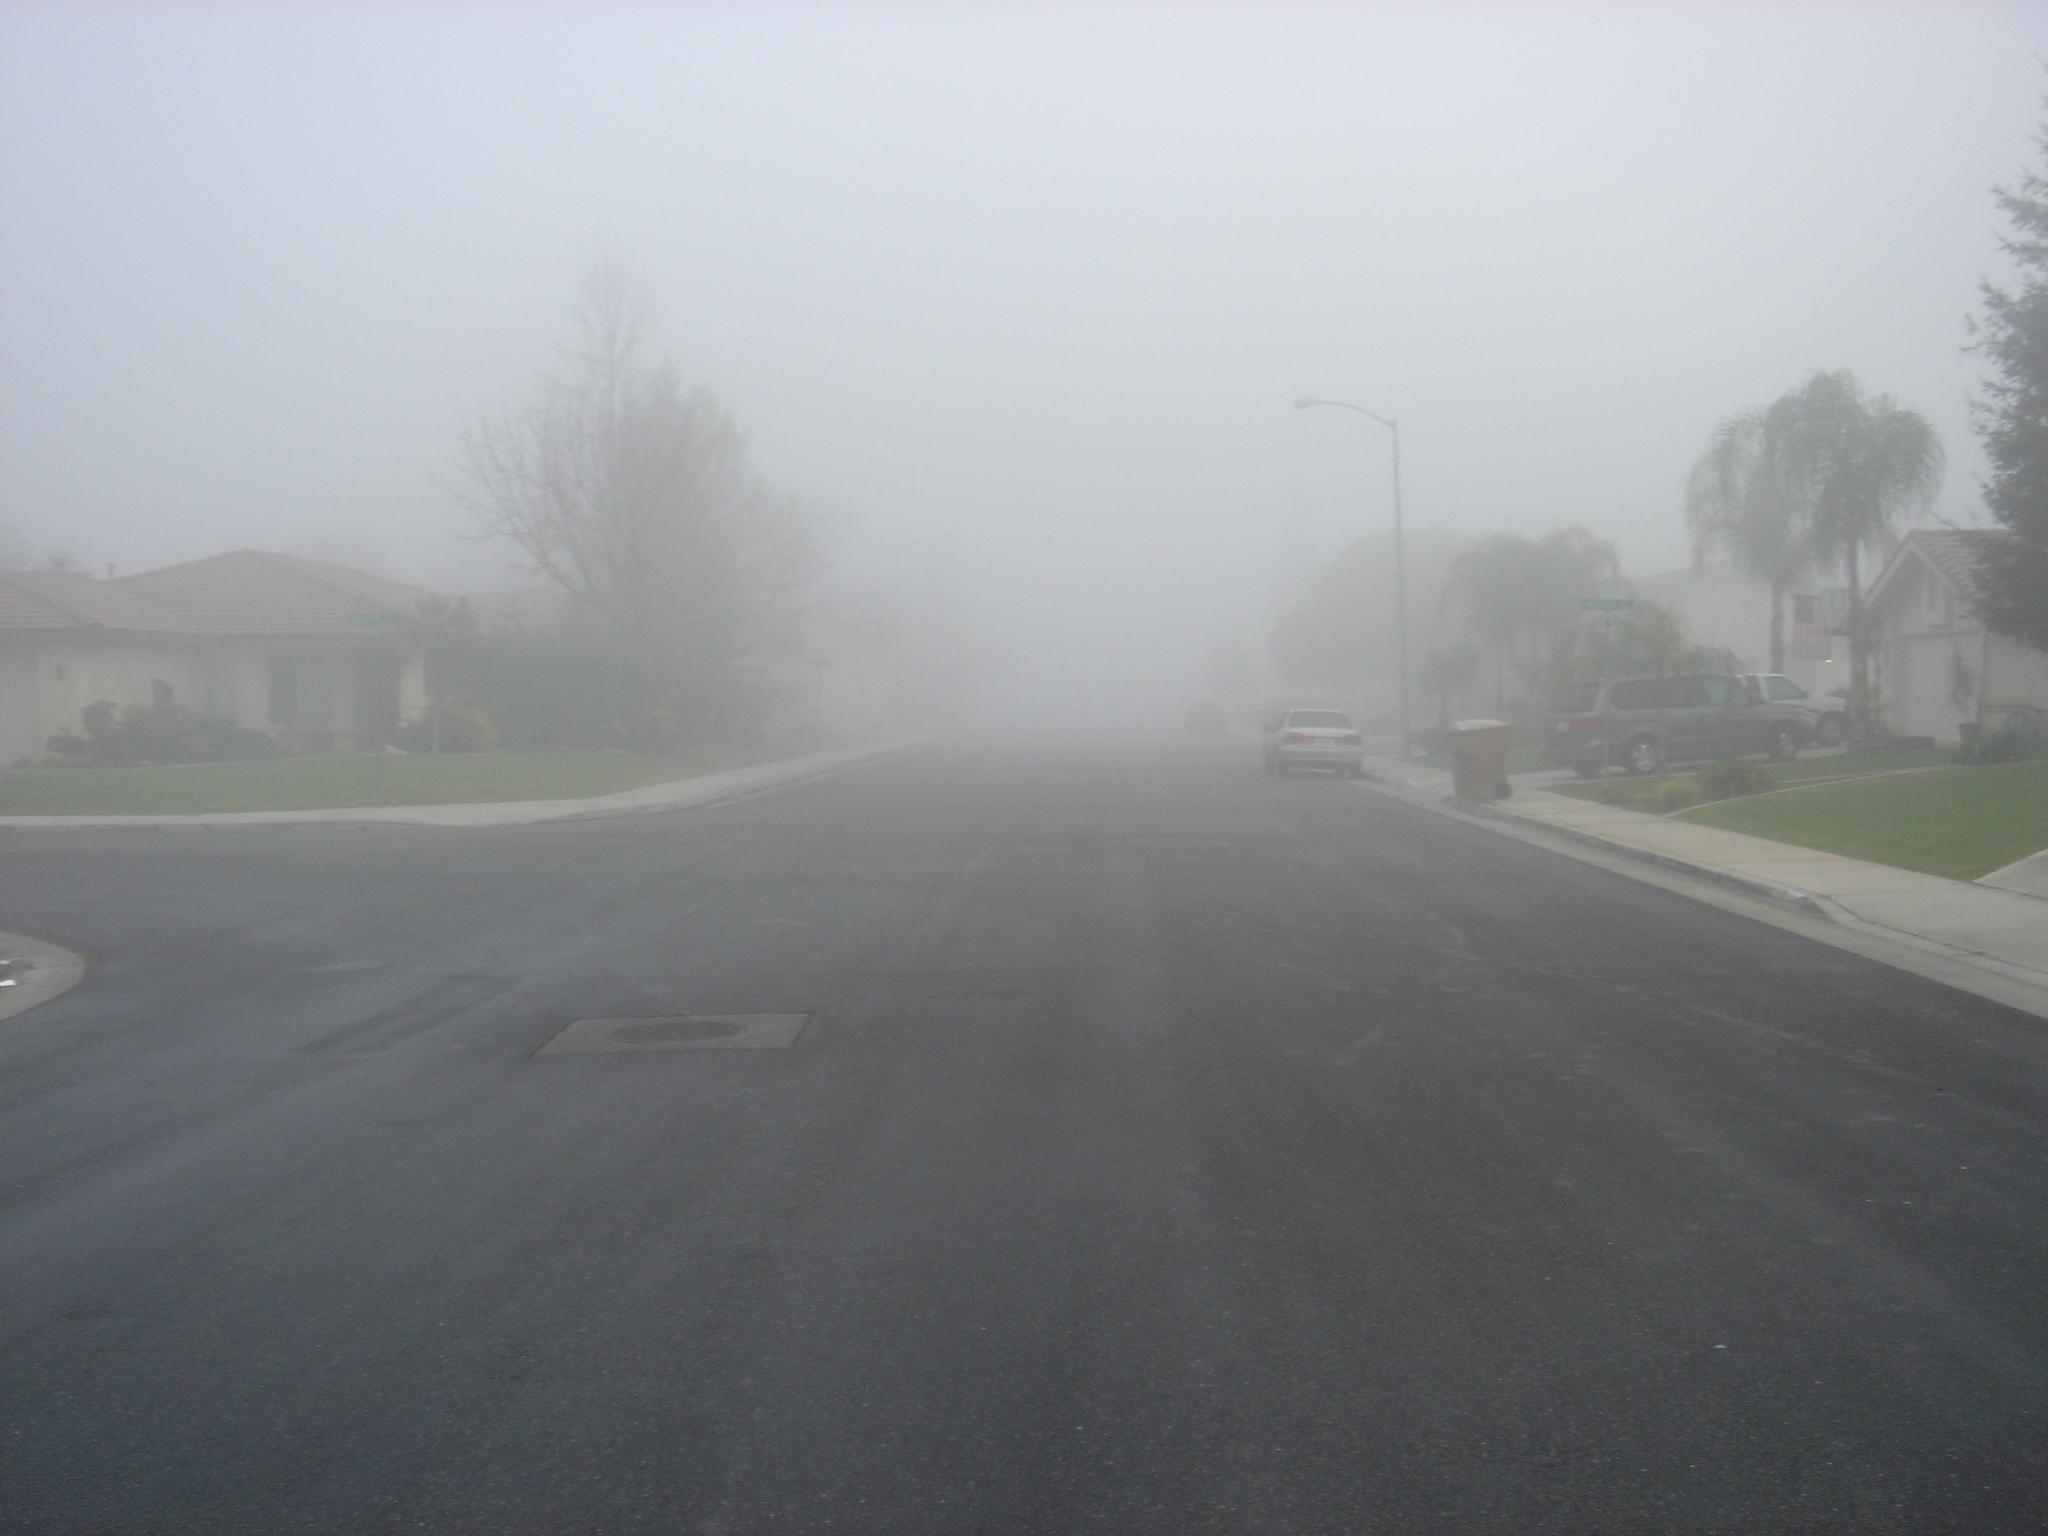 Tule fog in Bakersfield, California